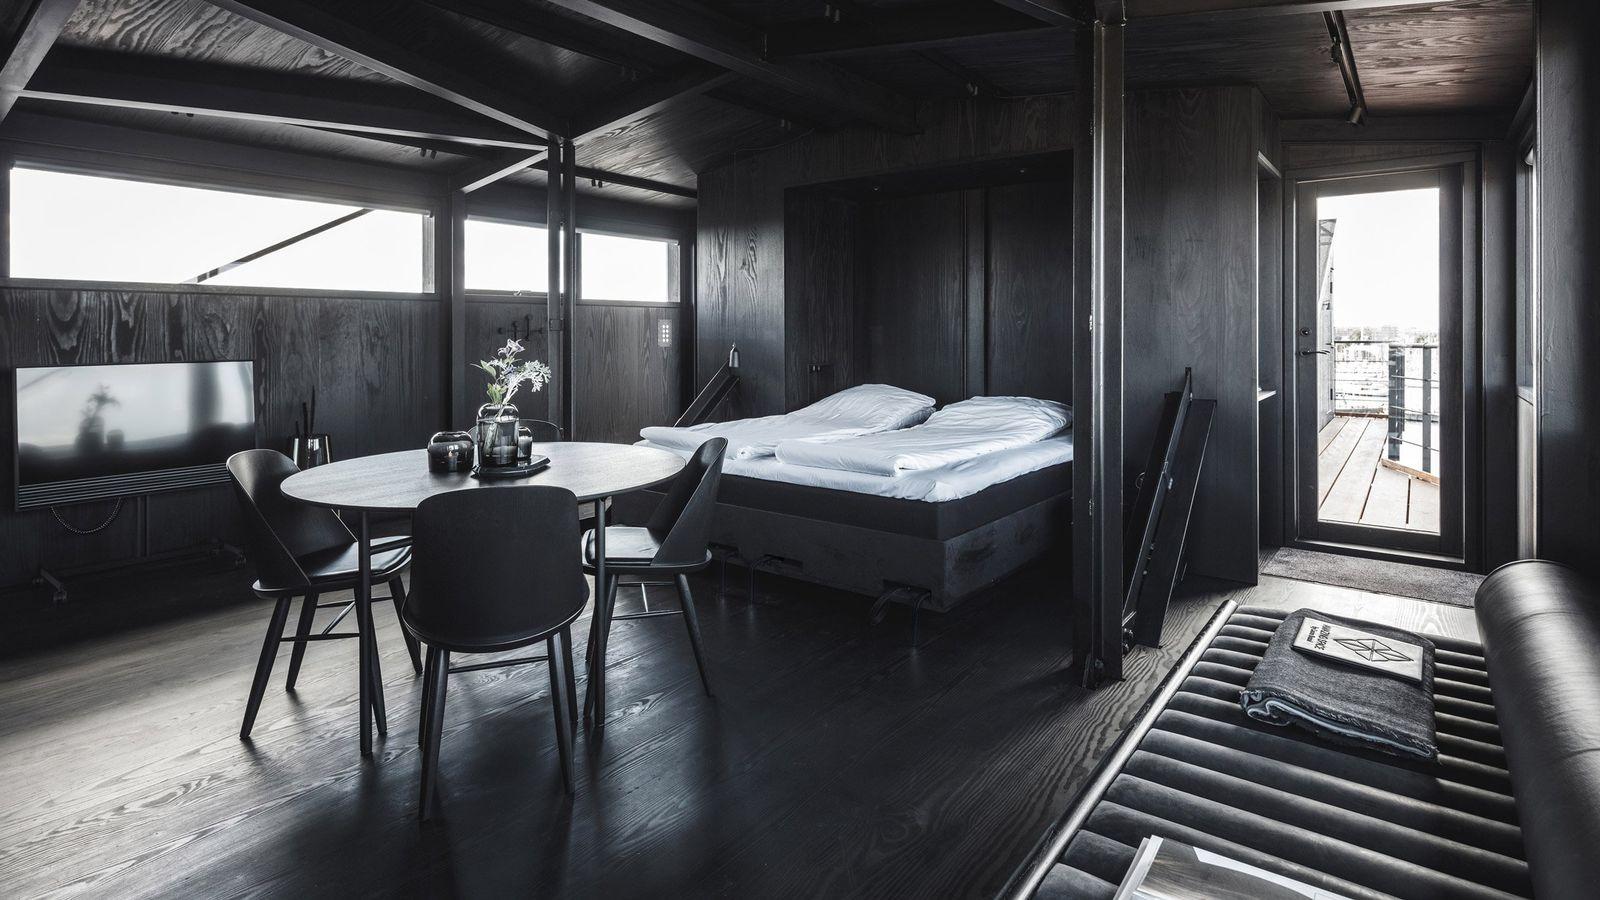 Industrial crane transformed into retreat meeting space/ spa - Copenhagen